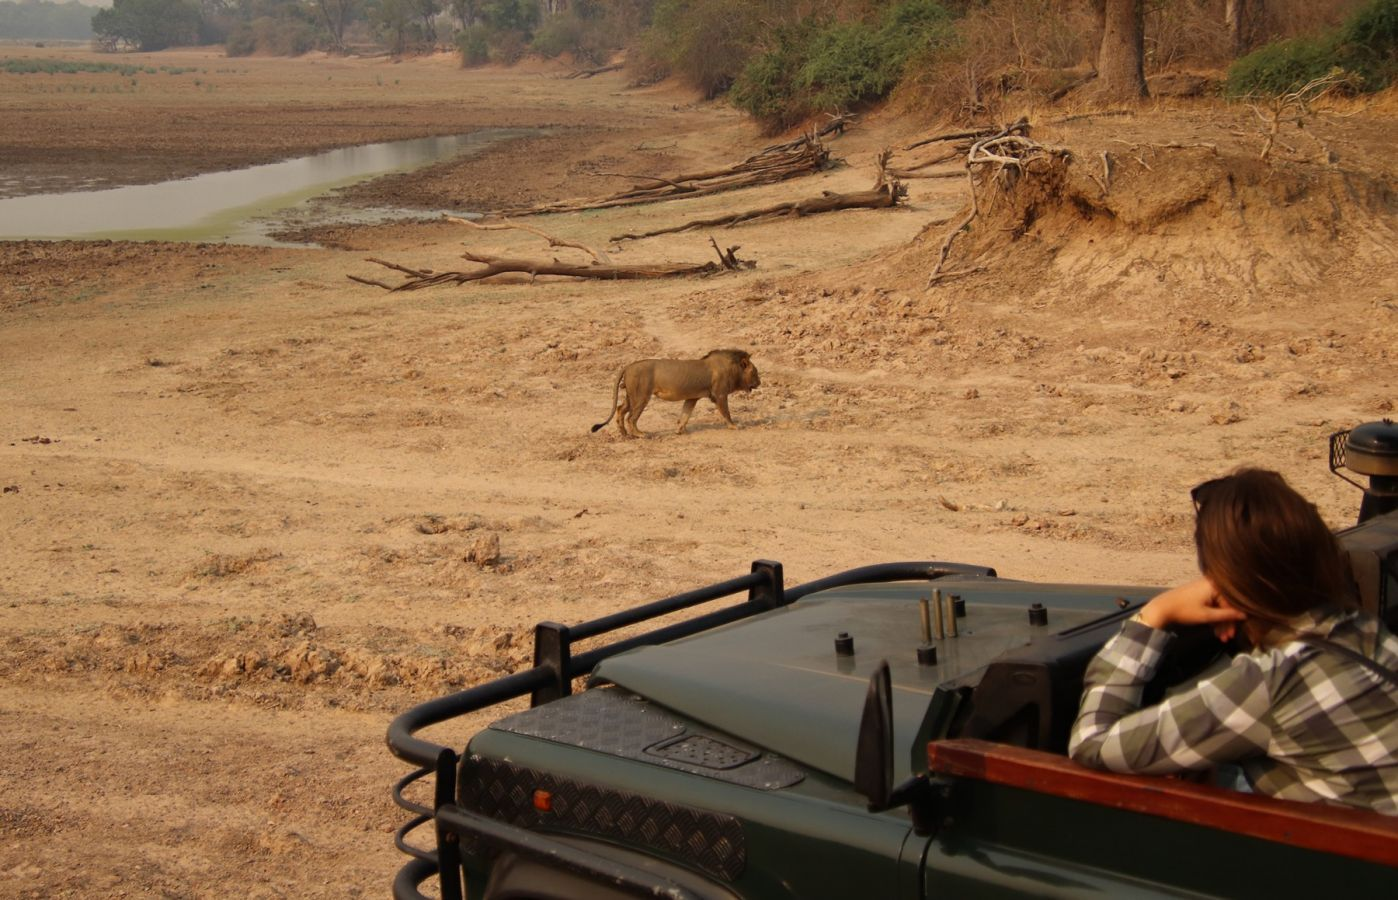 Flatdogs Camp leeuw tijdens game drive safari